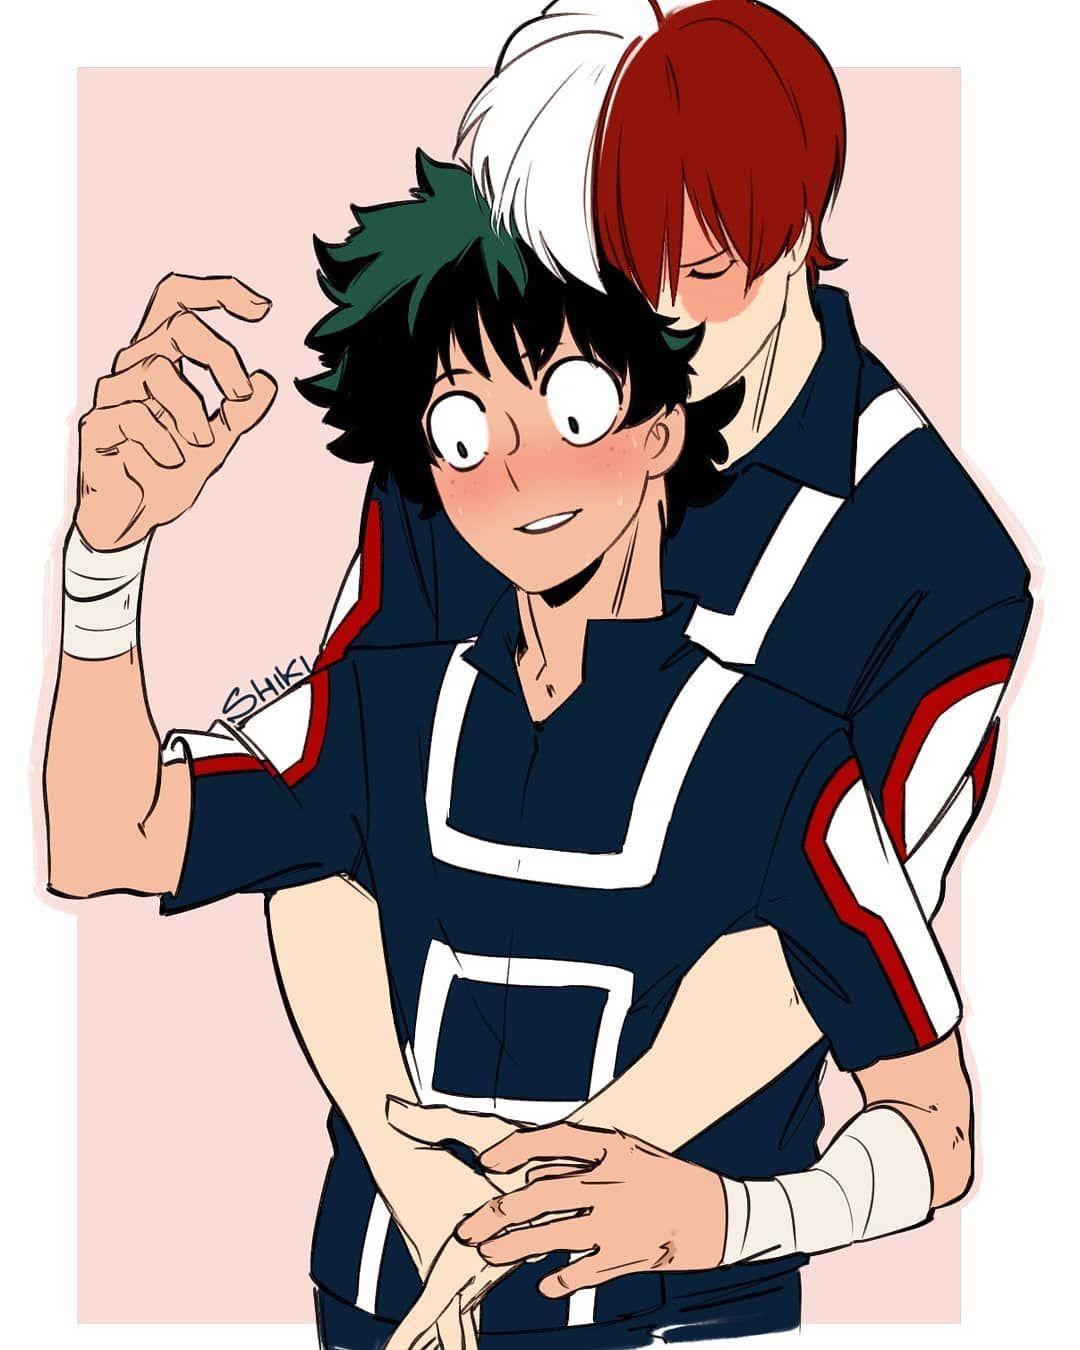 #anime #art #fanart #drawing #sketch #bnha